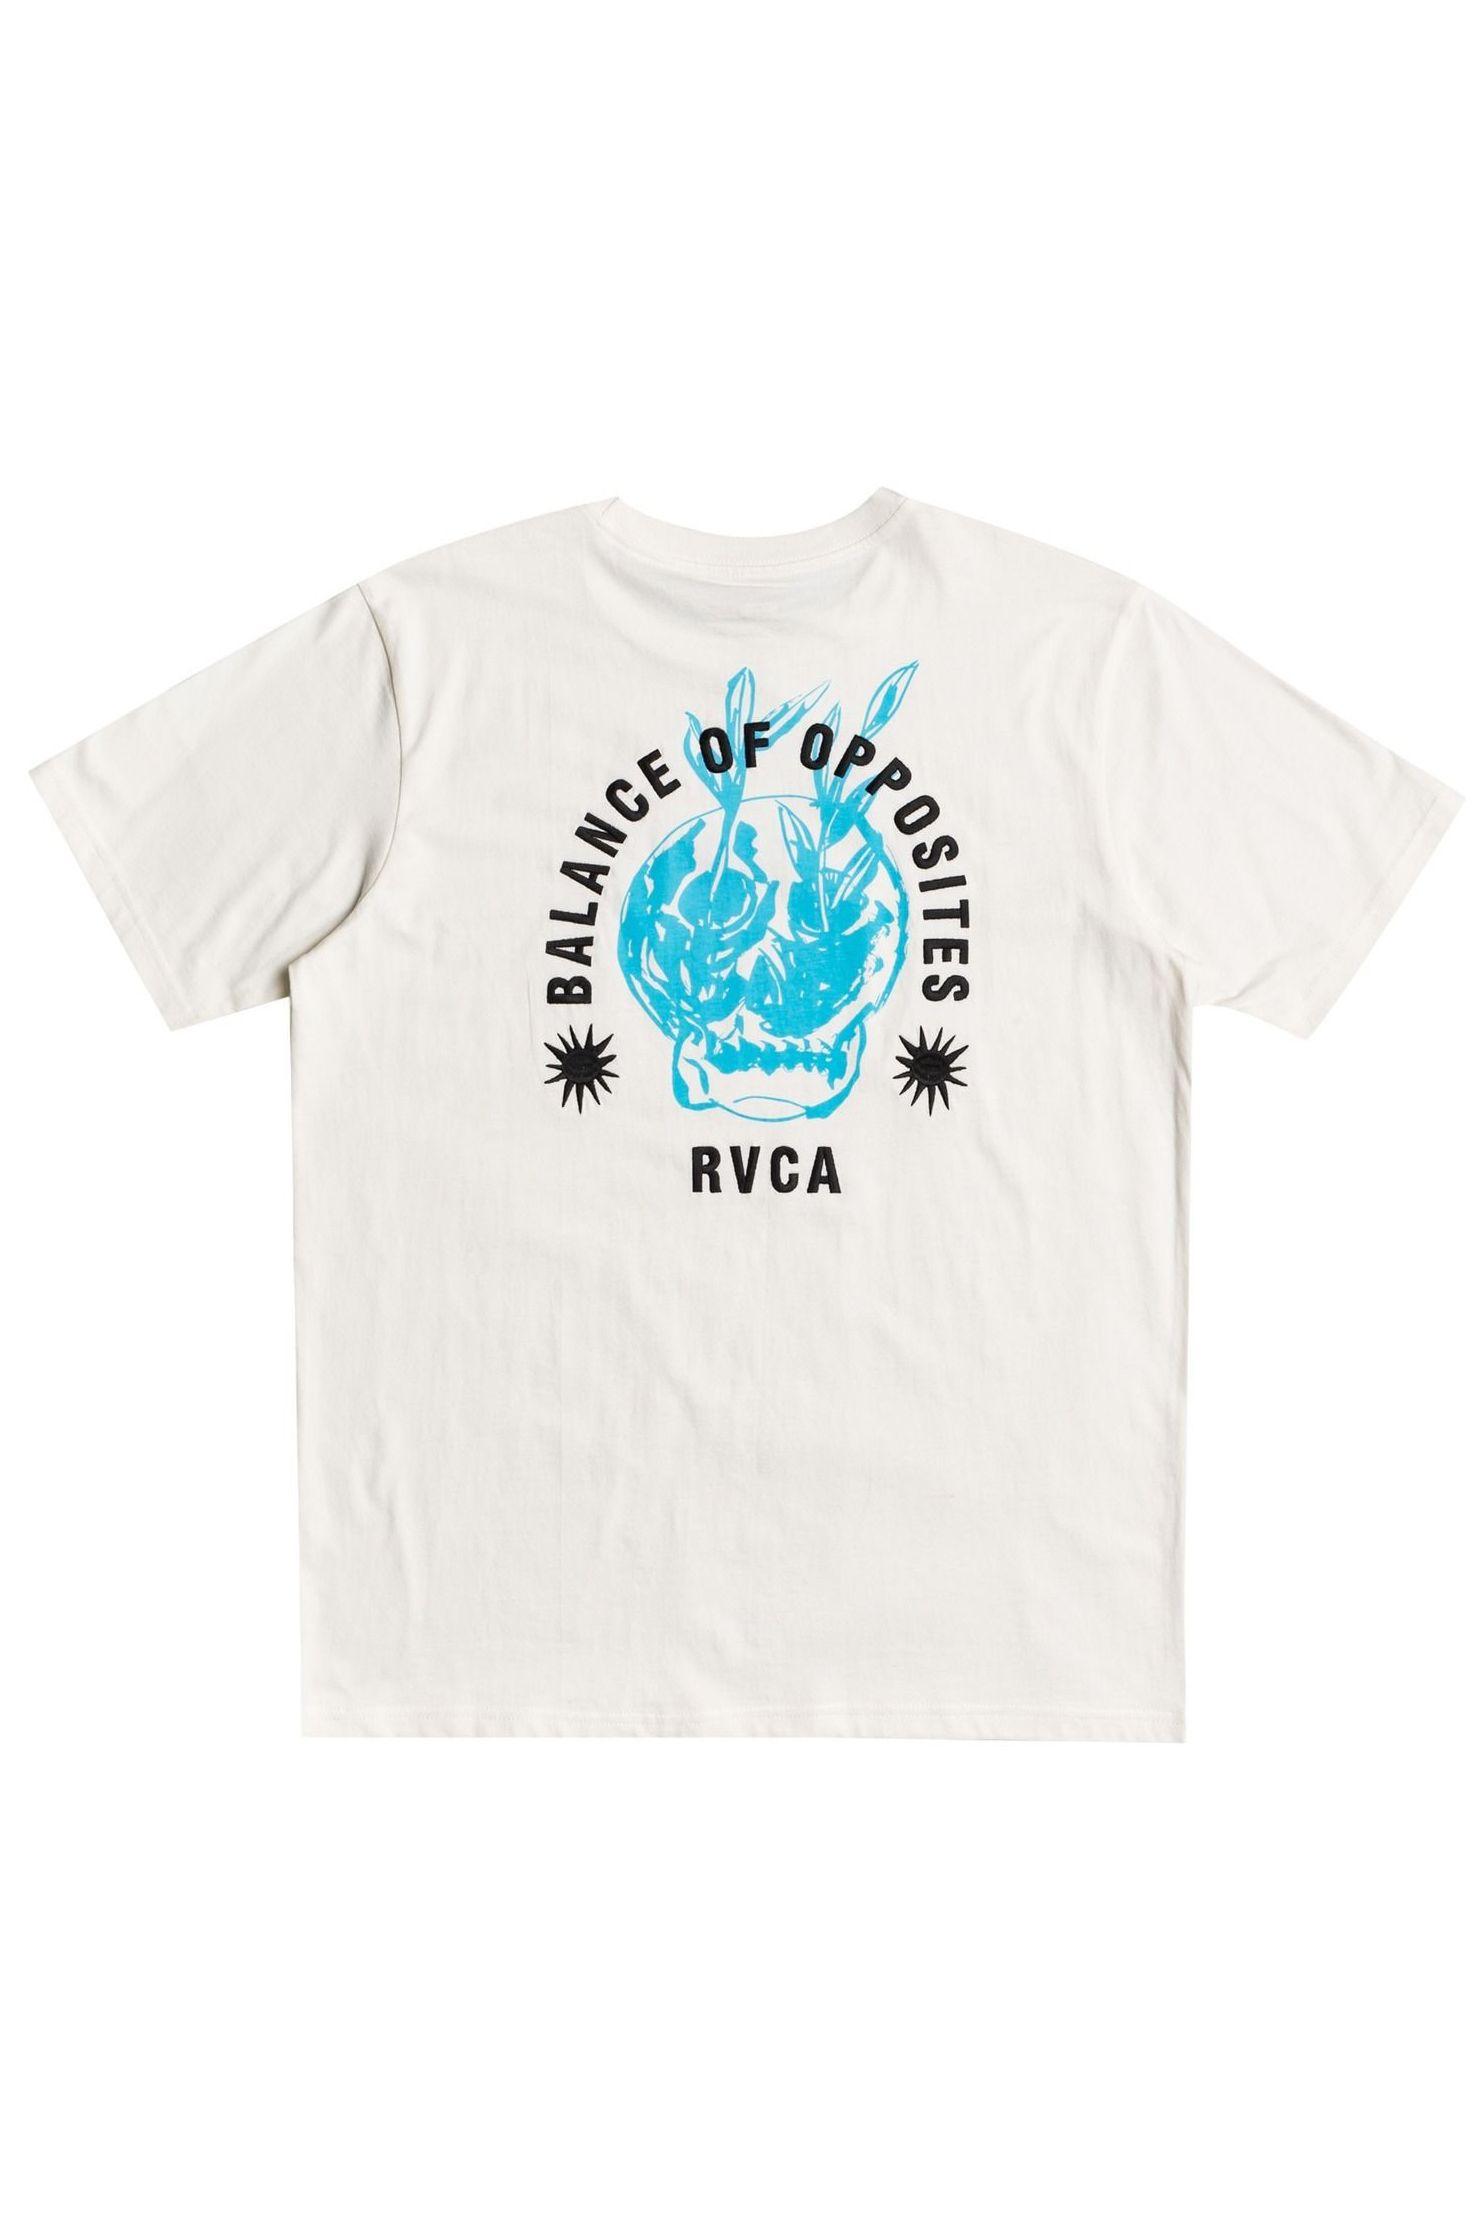 T-Shirt RVCA RVCA BALANCE SUPERBLAST Antique White